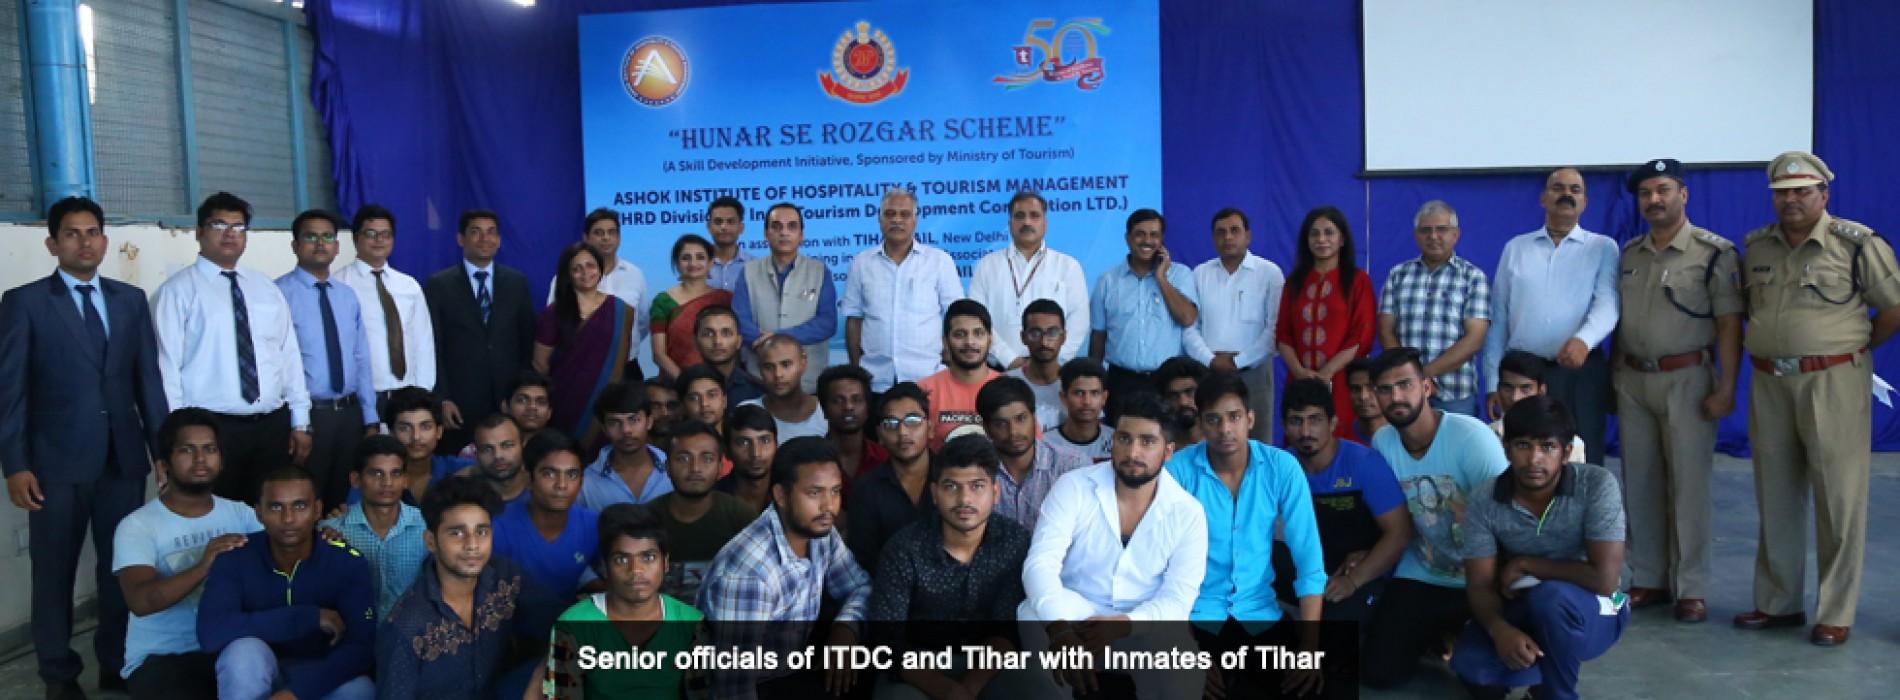 "ITDC steps up for Tihar Jail inmates to train them under ""Hunar se Rozgar Scheme"""